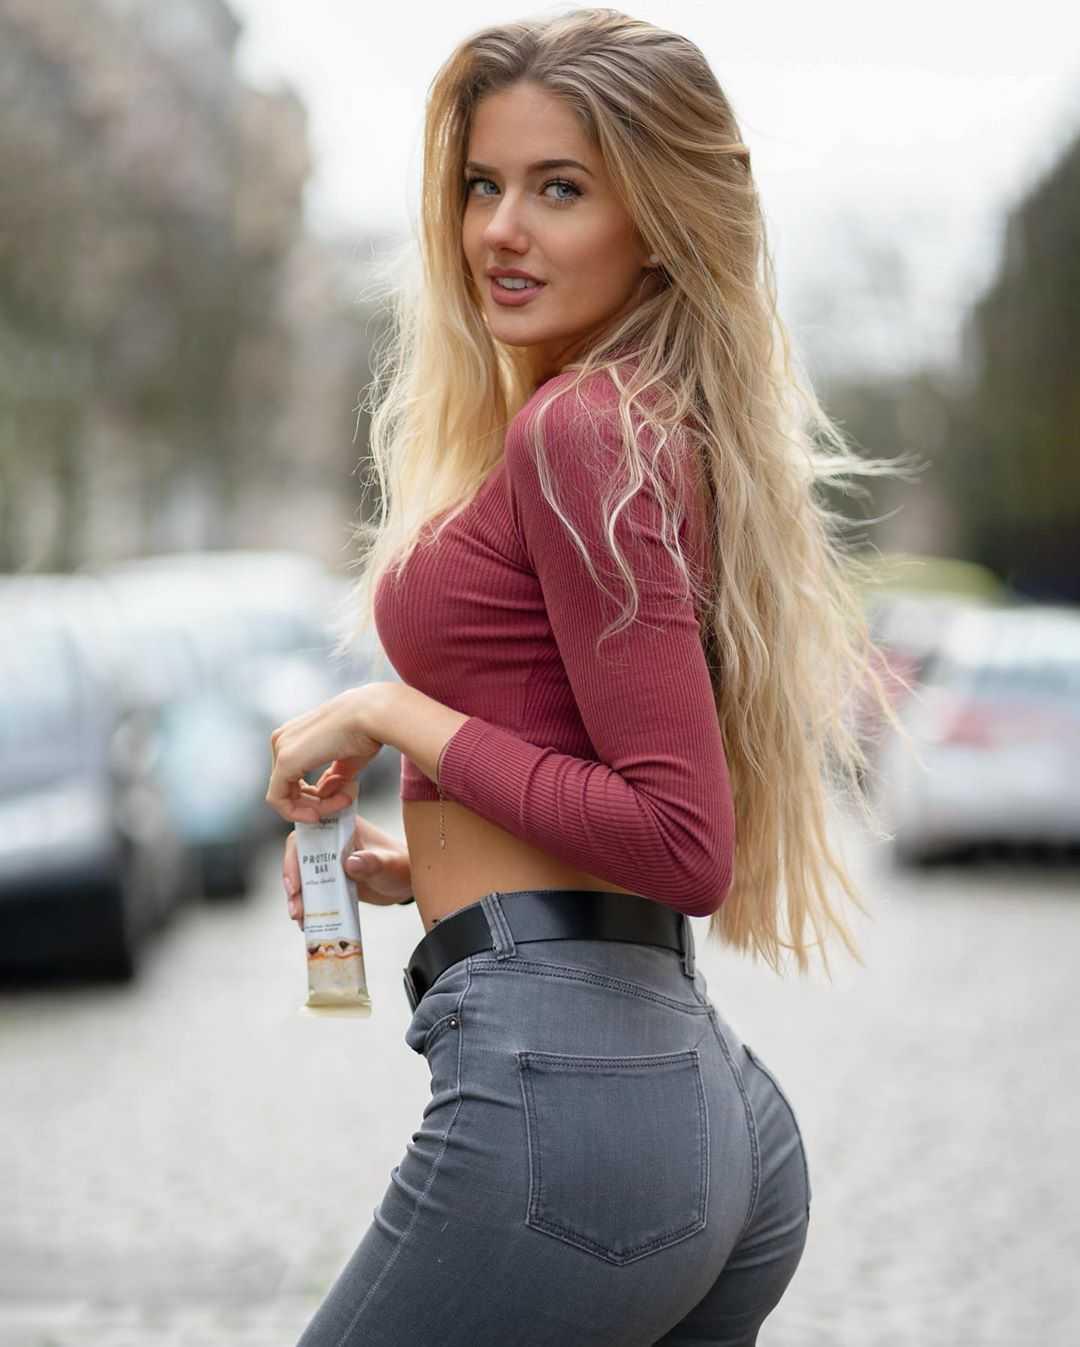 Alicia Schmidt sexy look pics